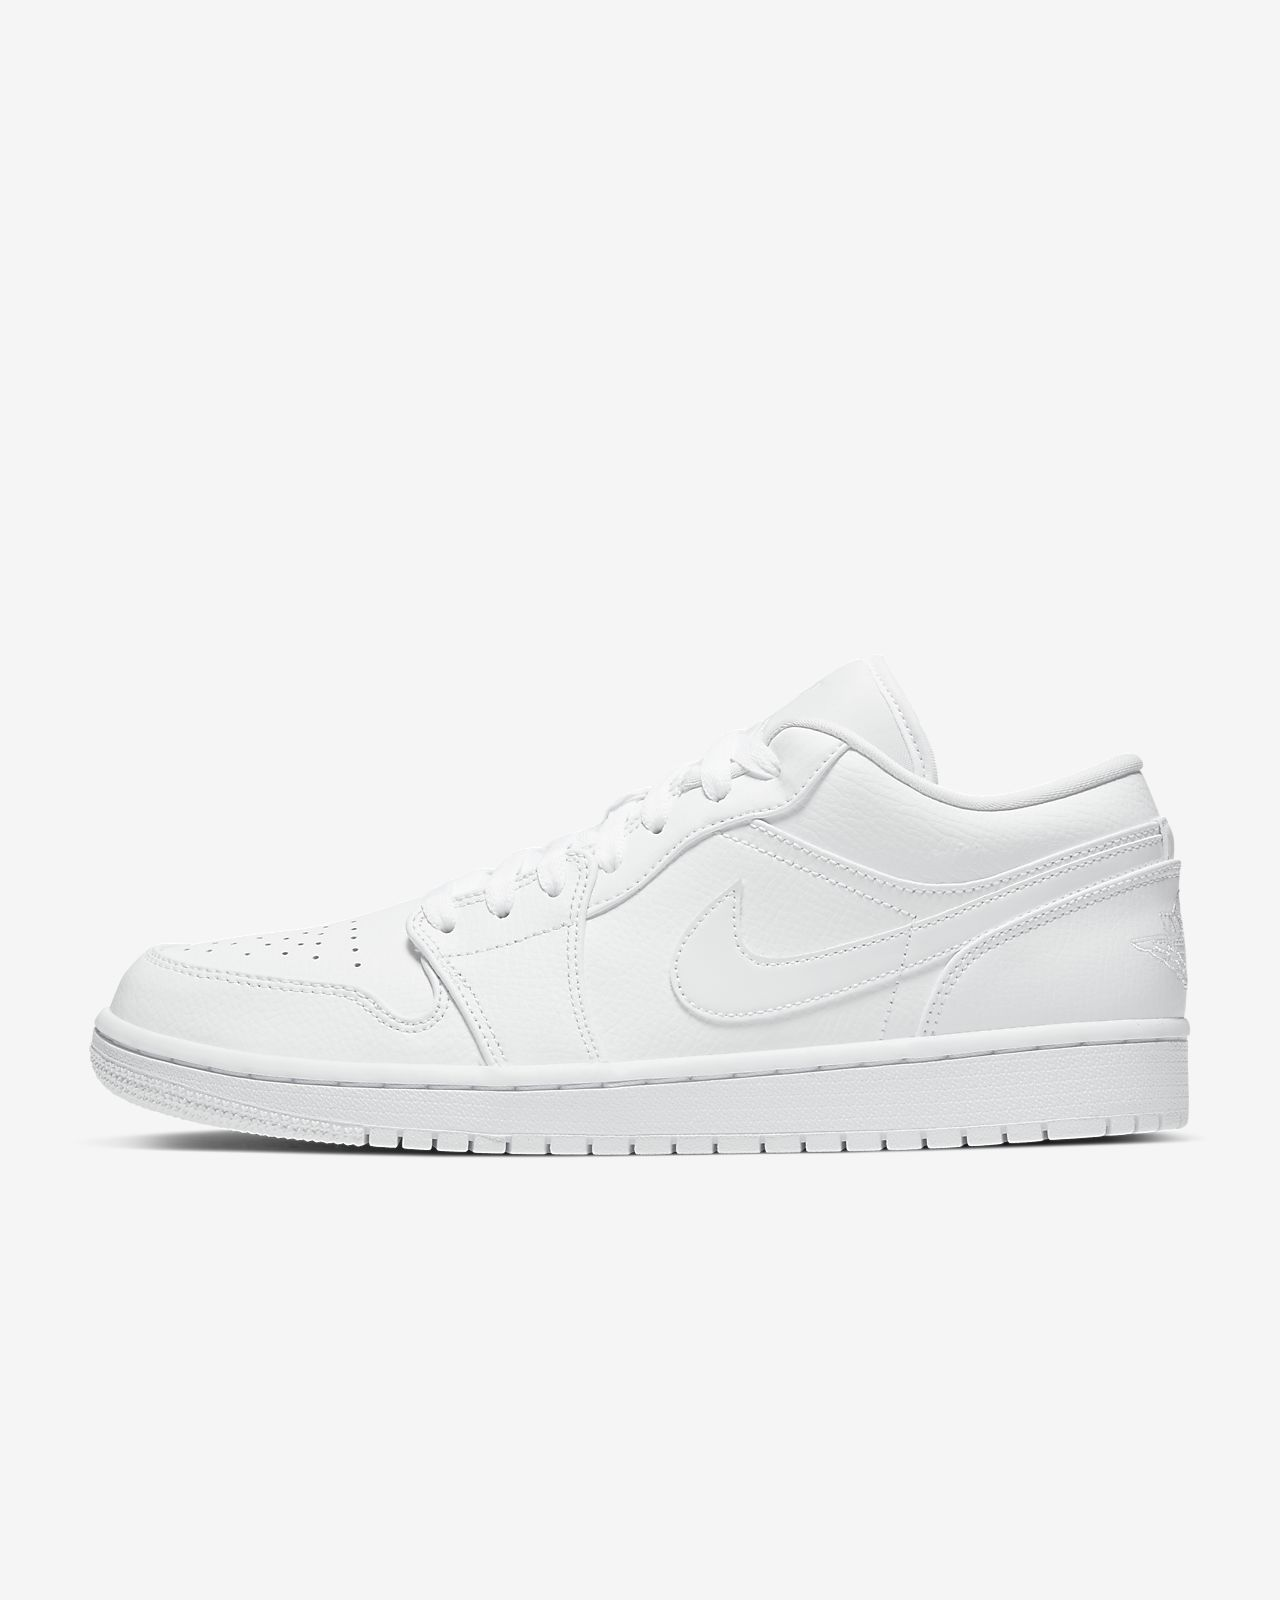 white low top air jordans